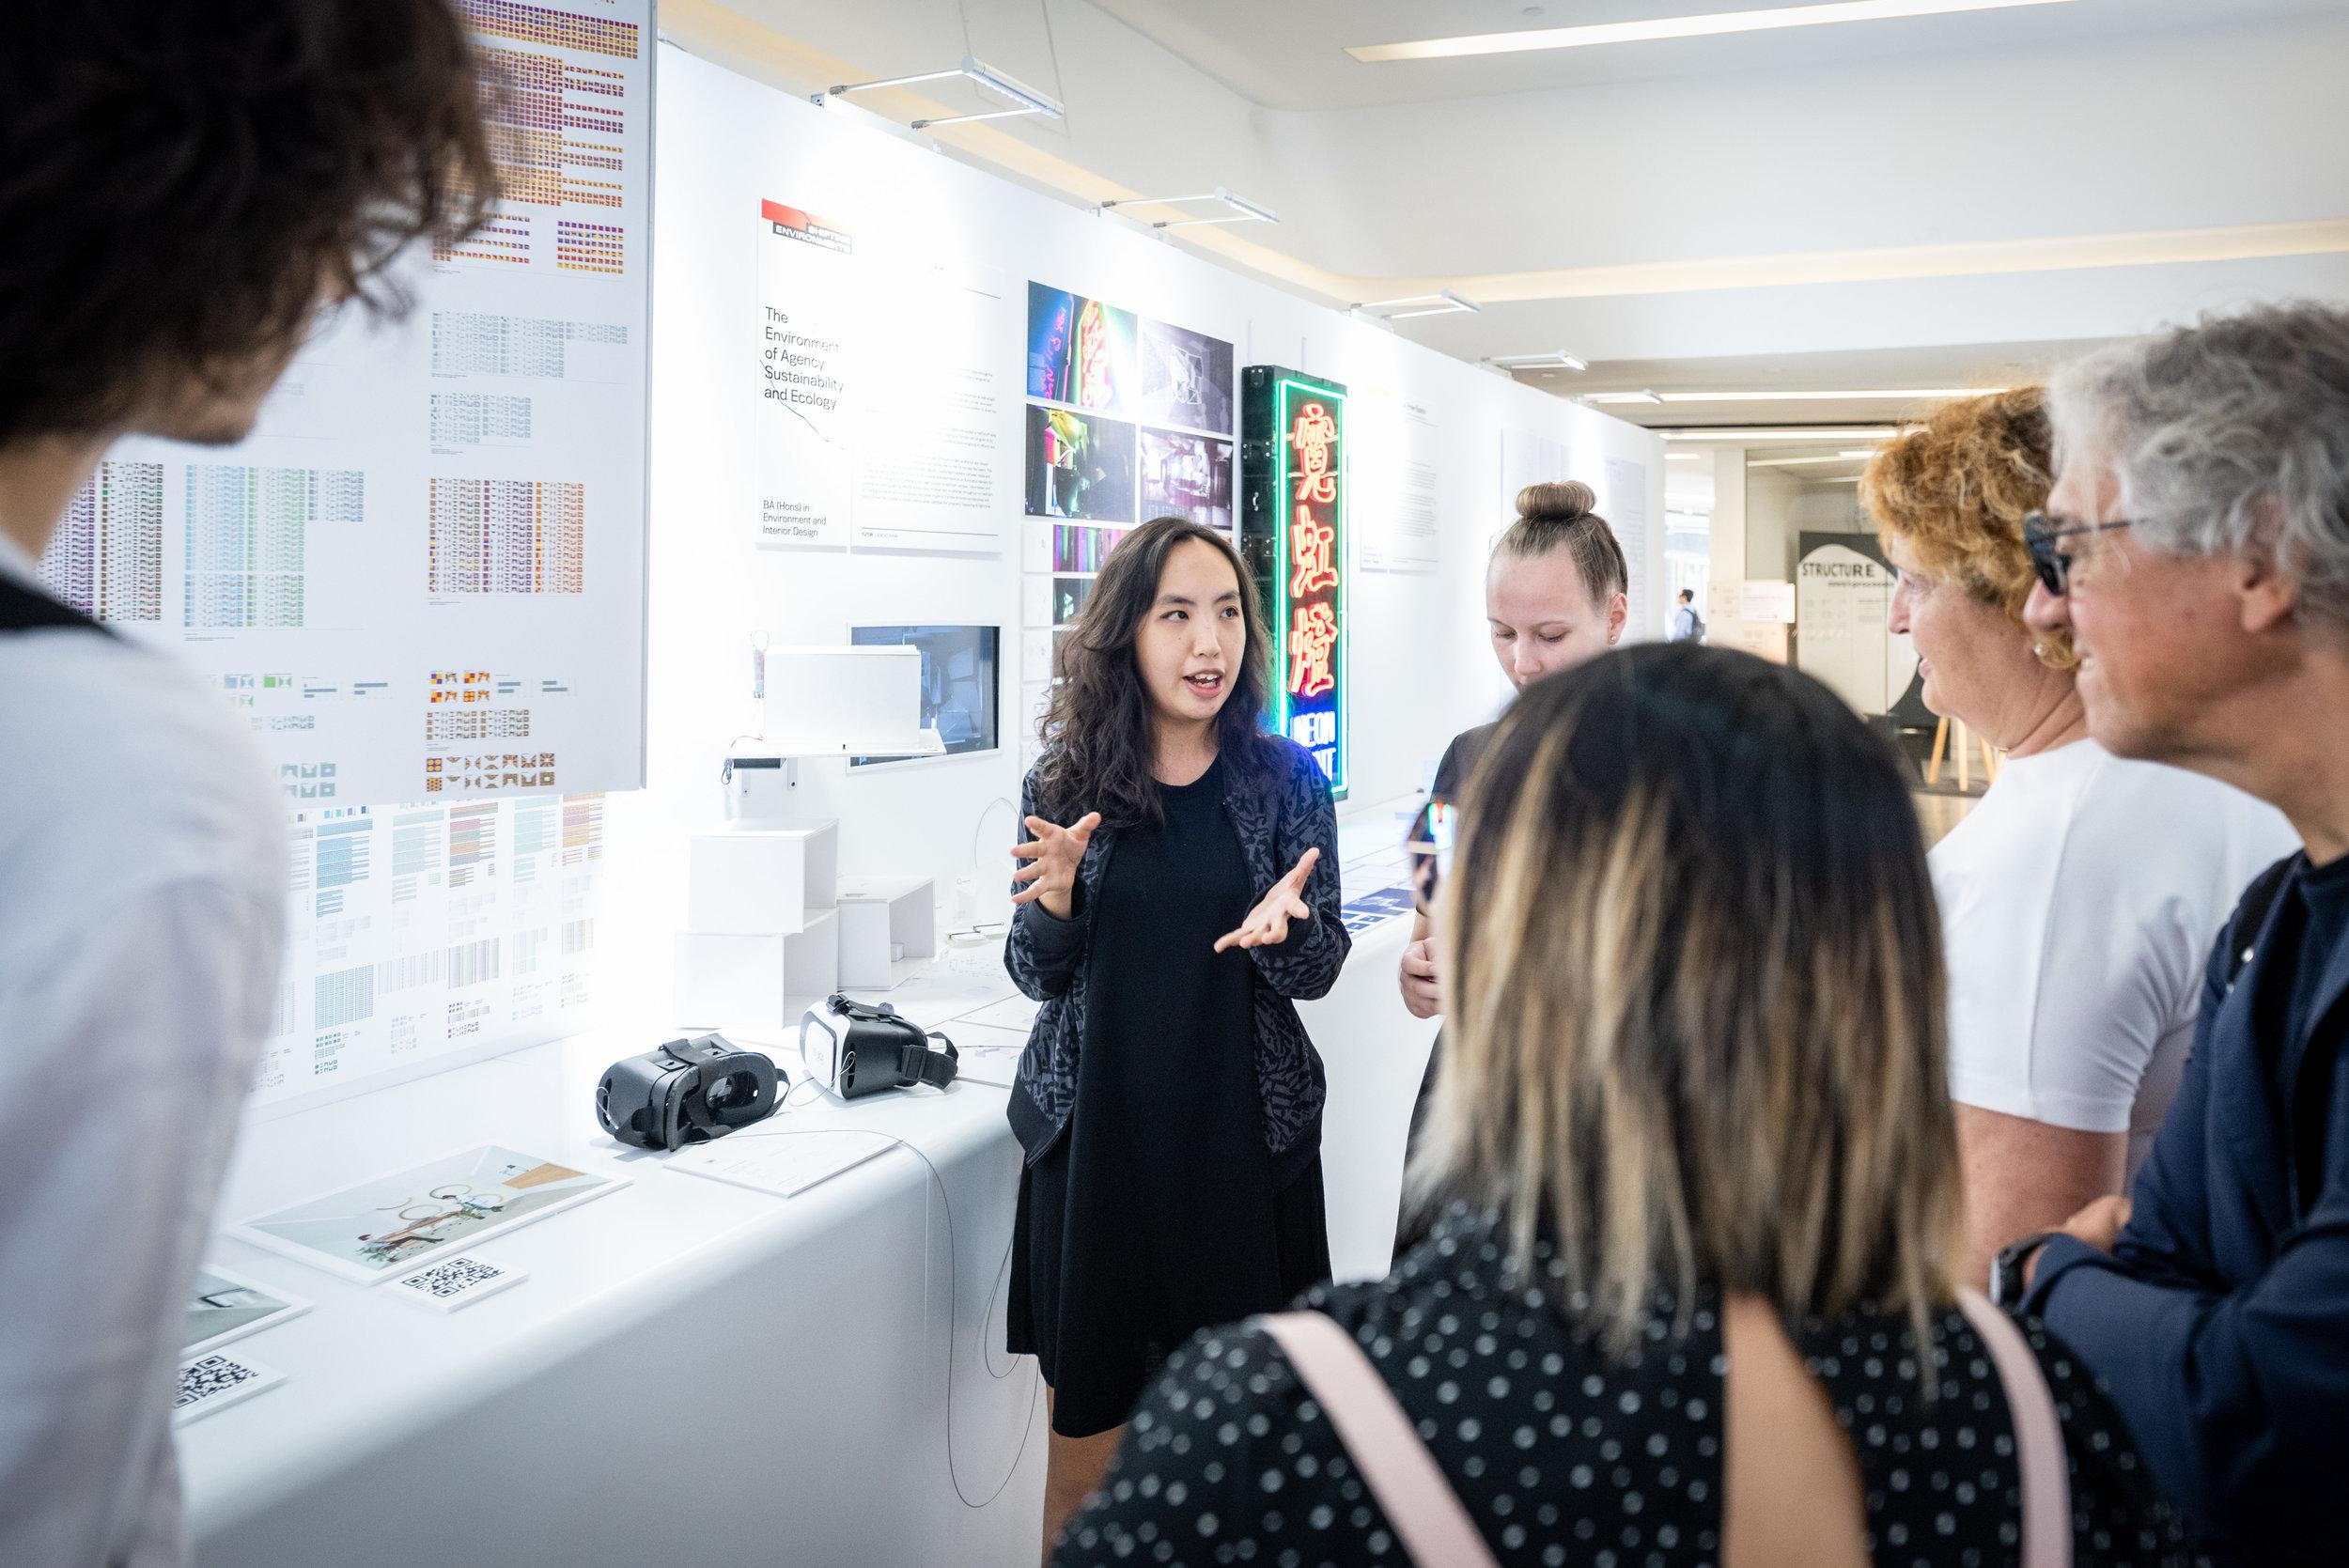 20190619 Poly U design school opening (44 of 219).jpg